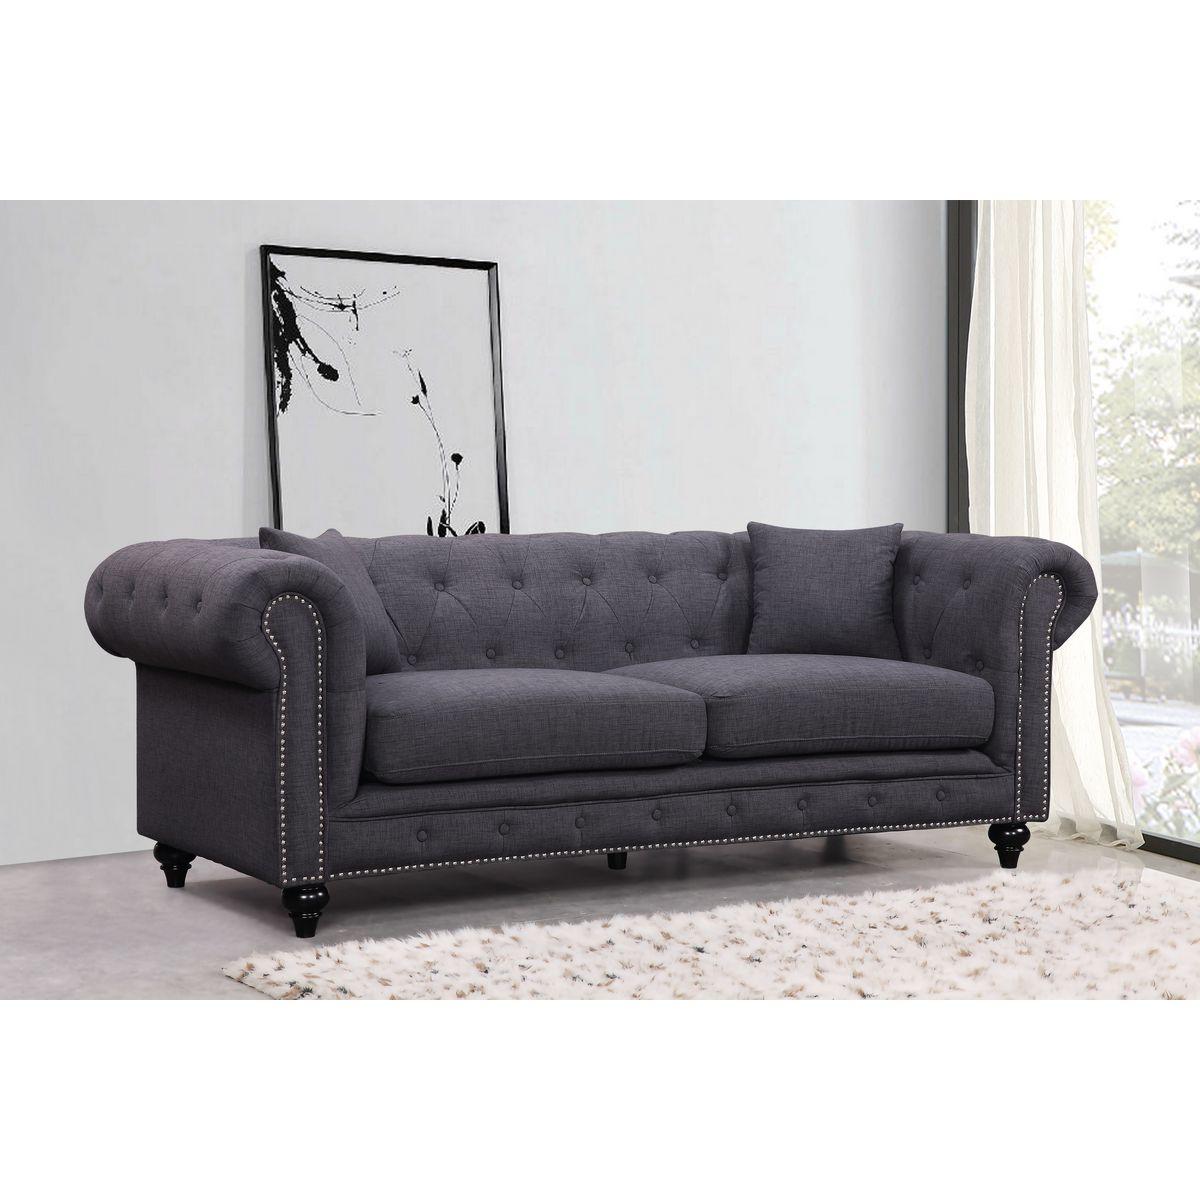 gray linen tufted sofa clean leather with fabric softener grey nailhead ferrara velvet free